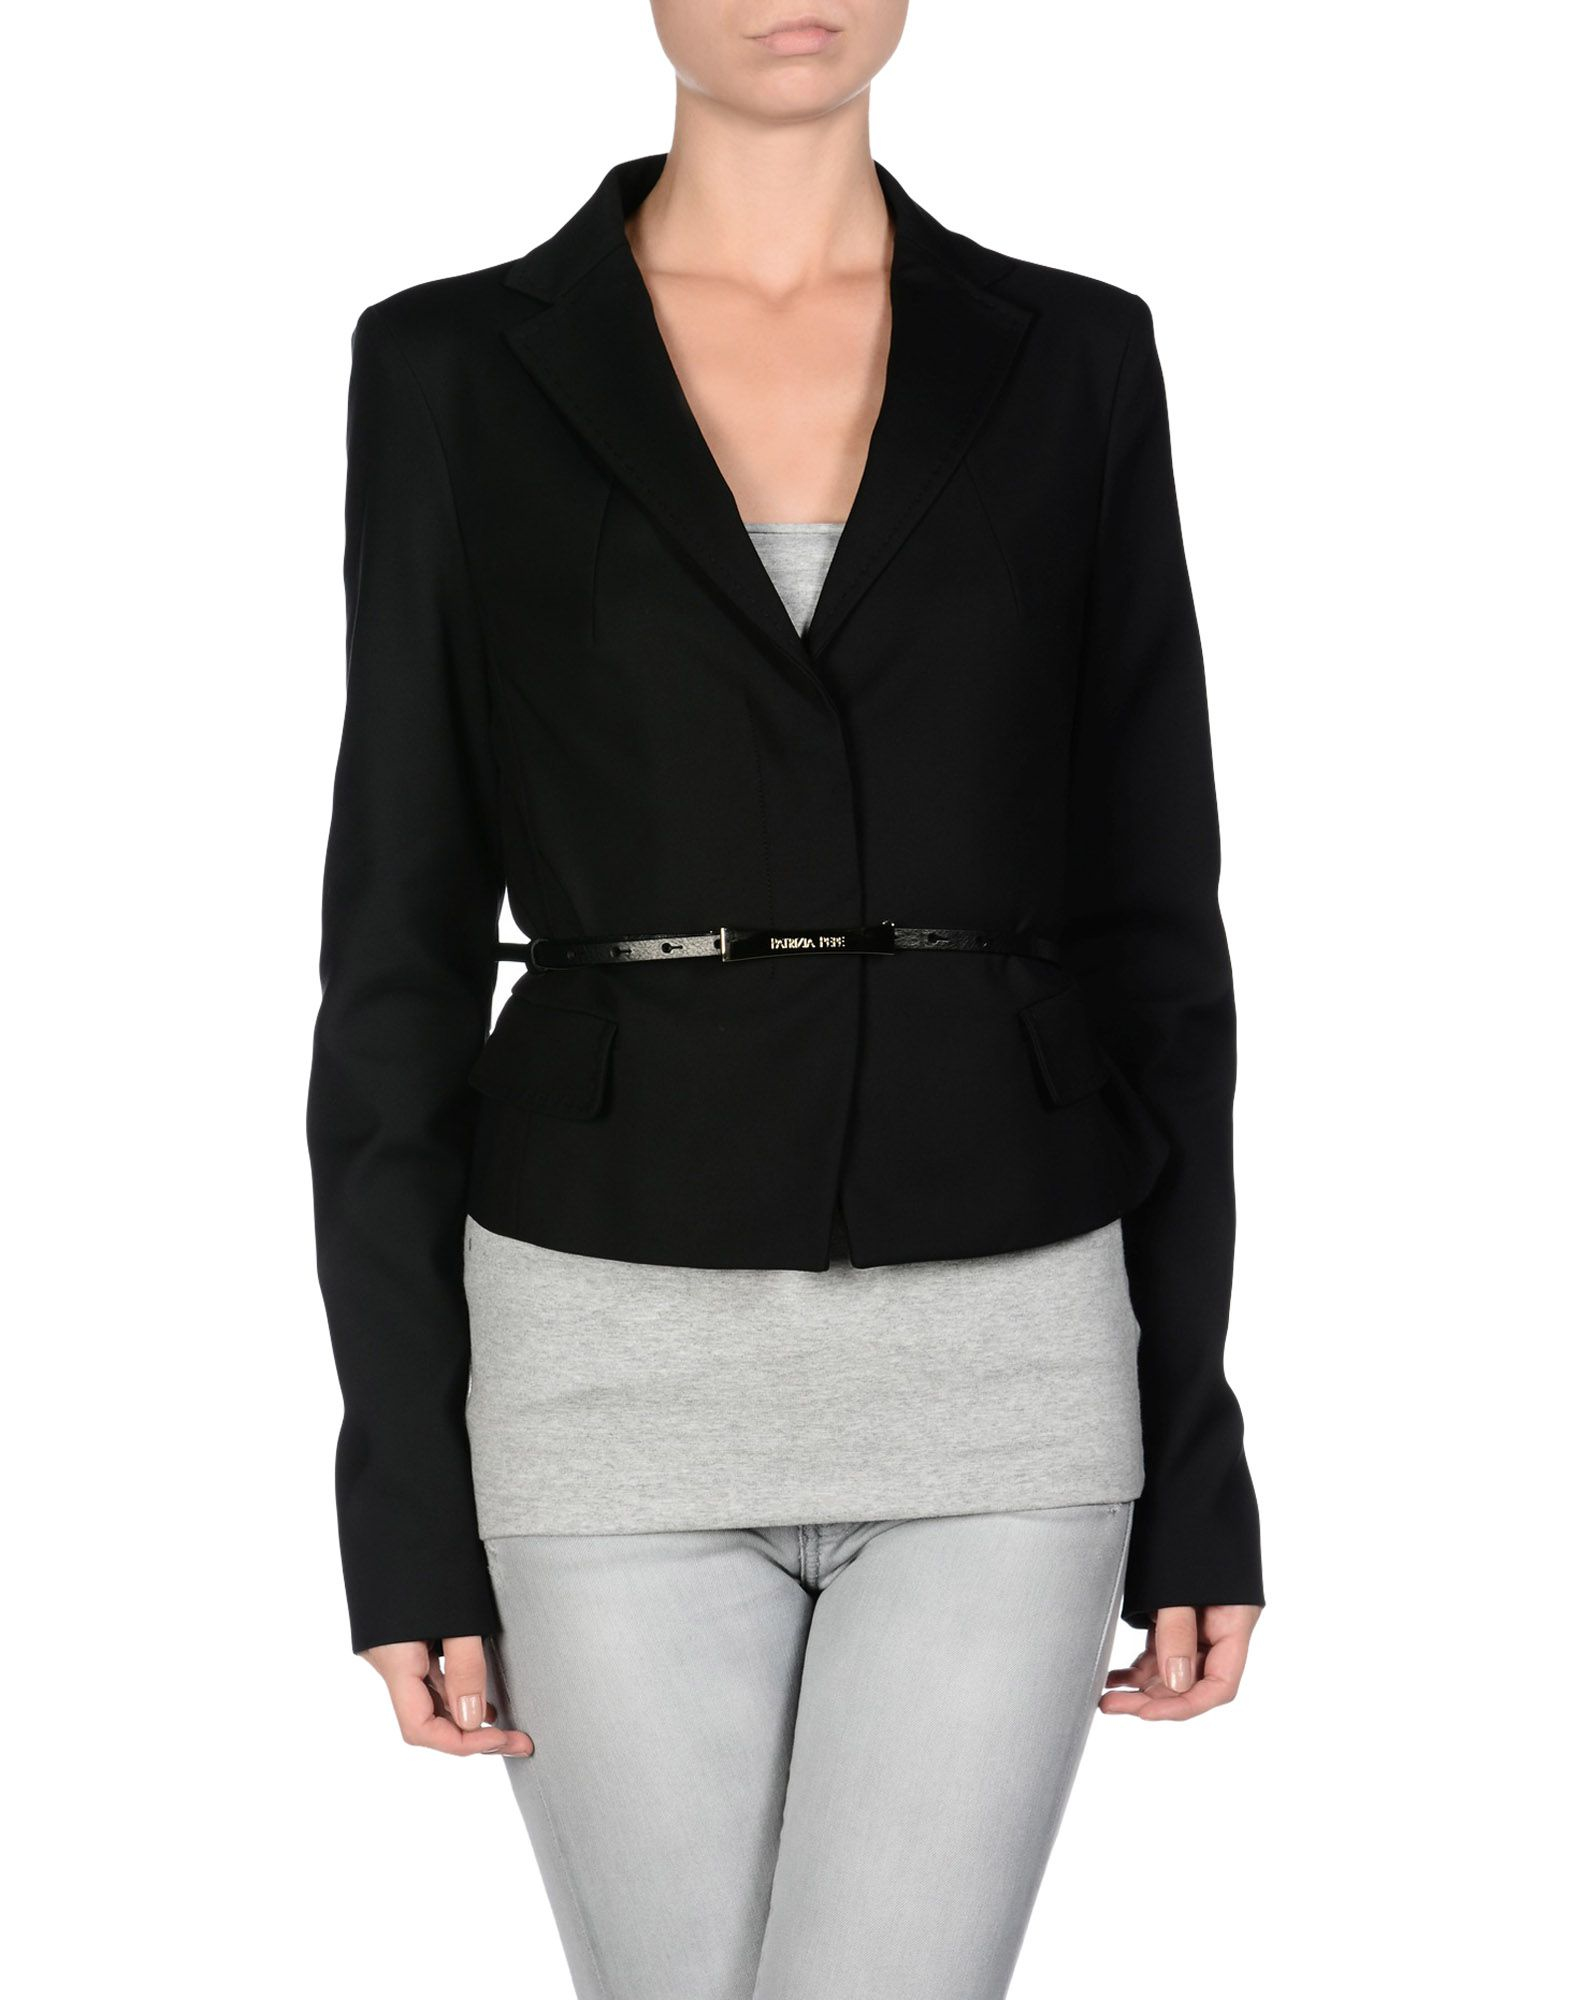 lyst patrizia pepe blazer in black. Black Bedroom Furniture Sets. Home Design Ideas